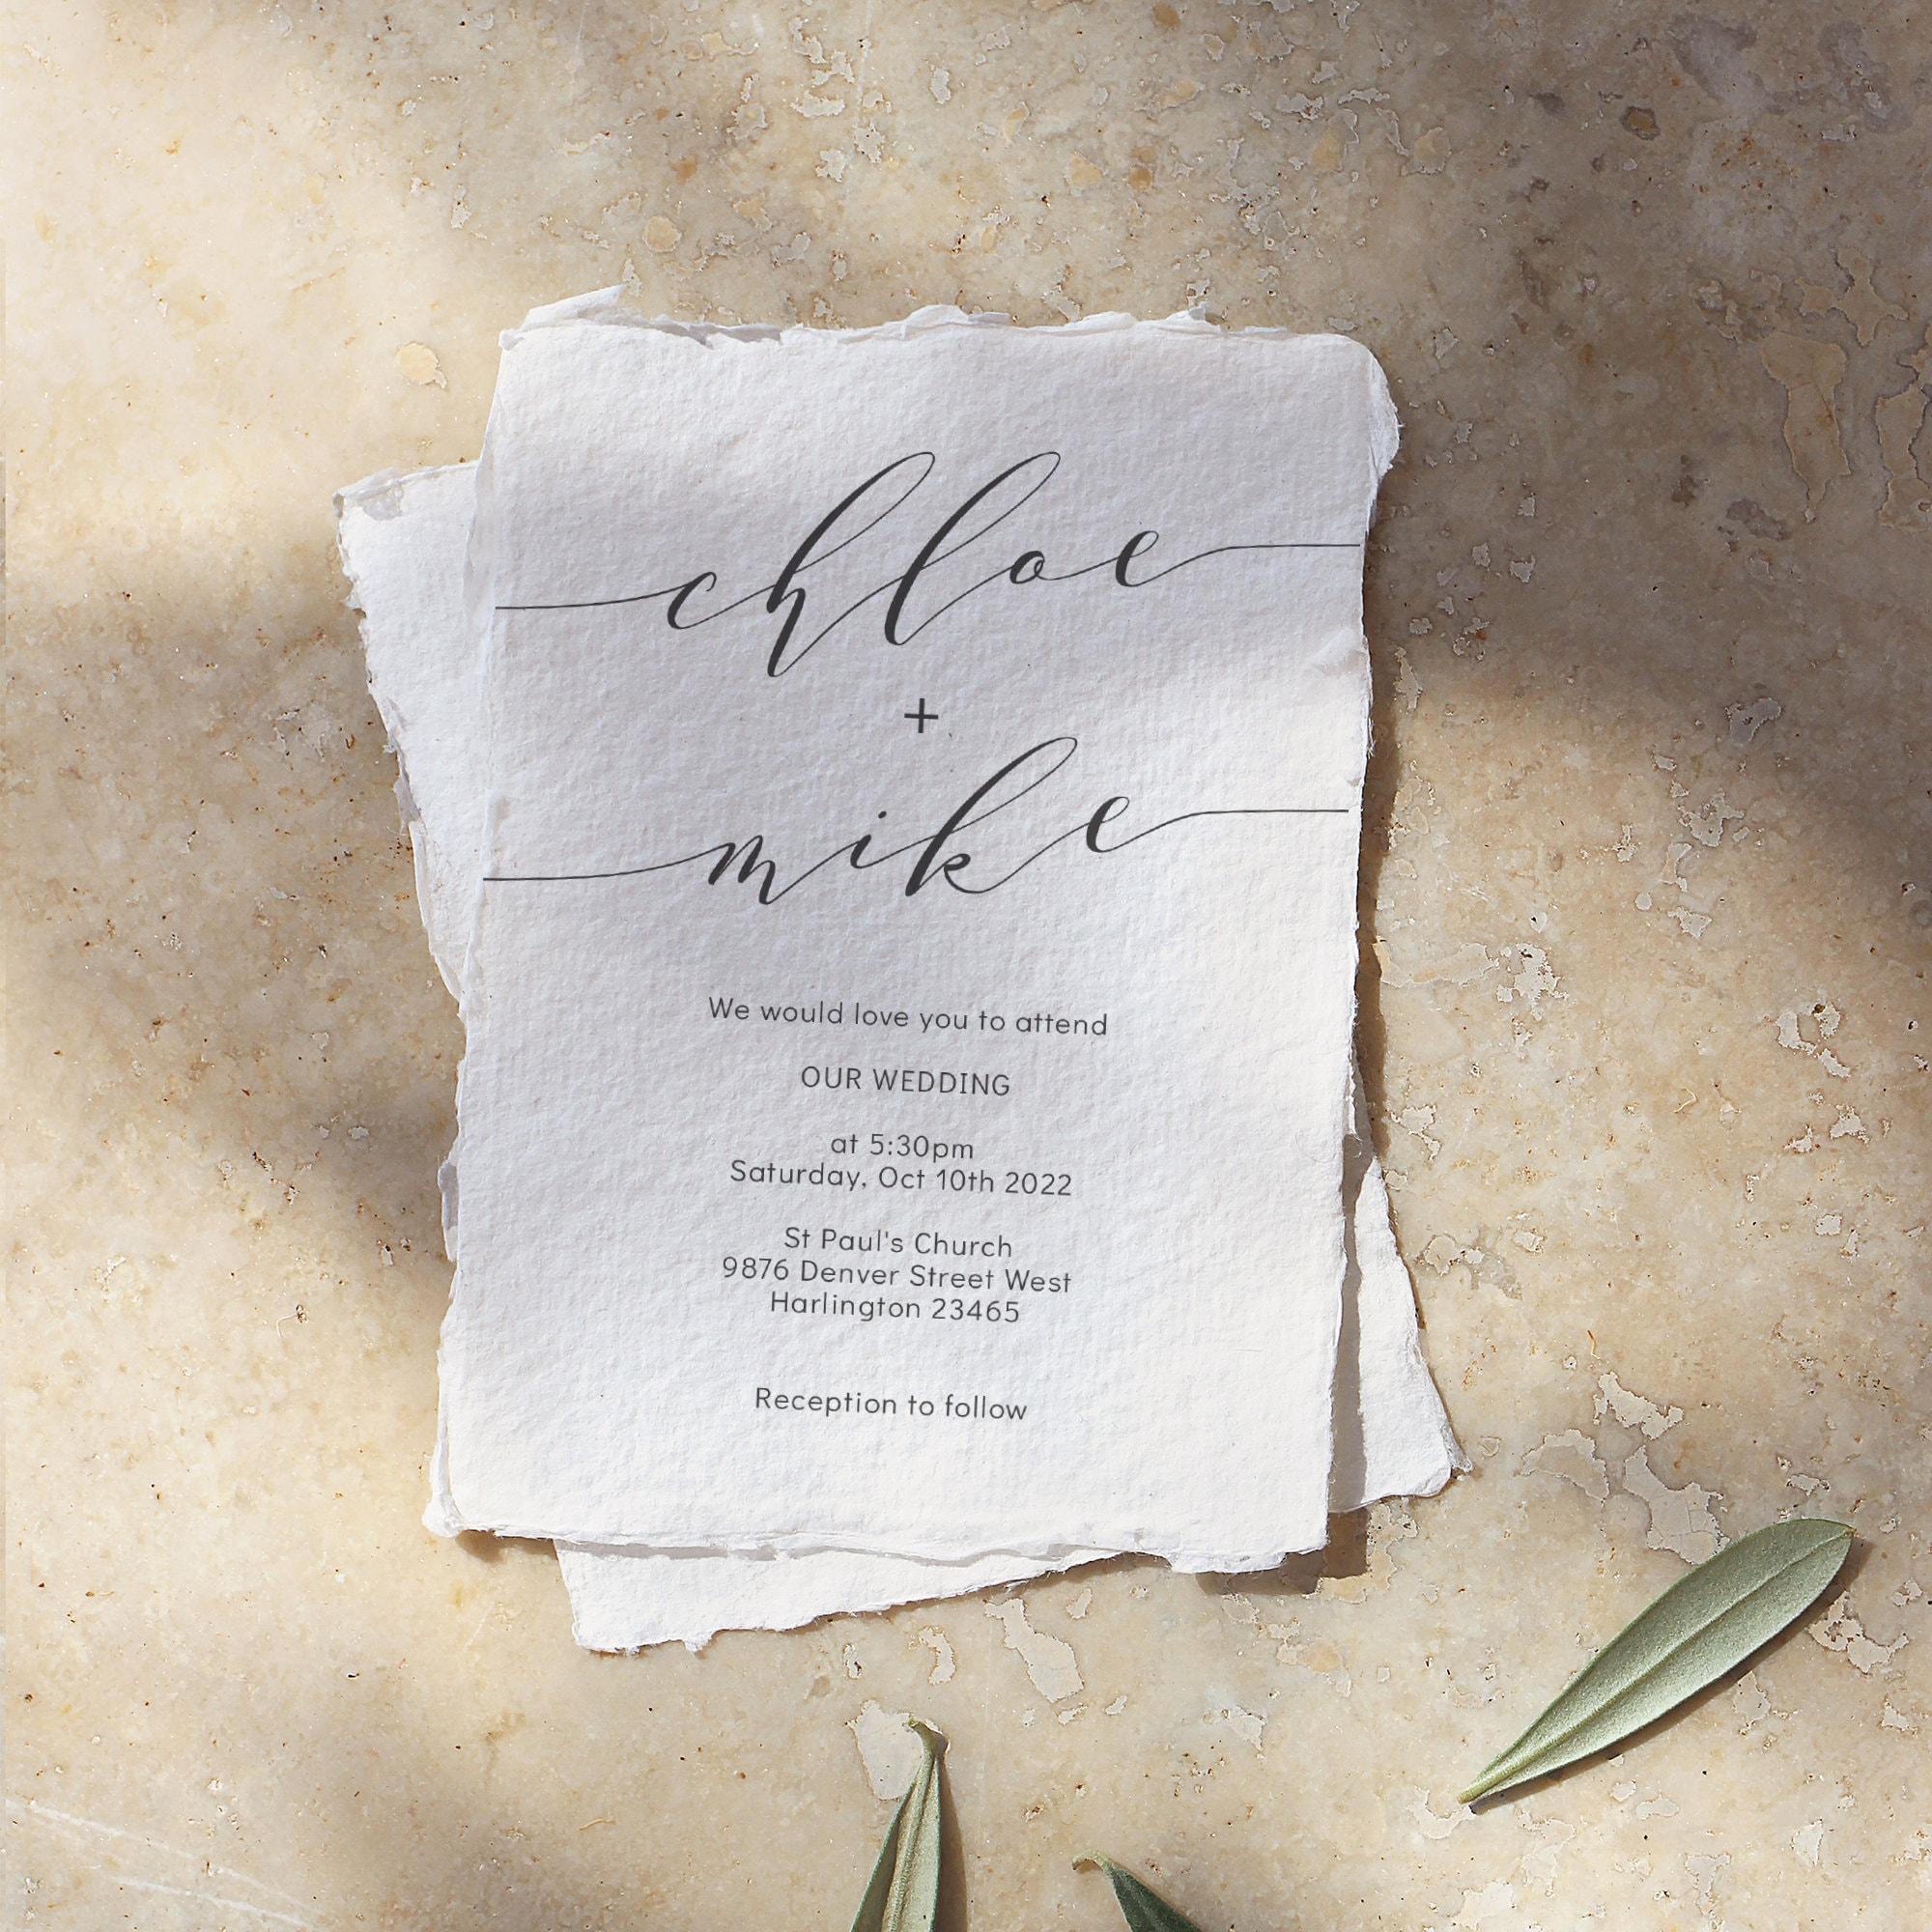 Romantic - Elegant Wedding Invitations, Modern Wedding Invitation